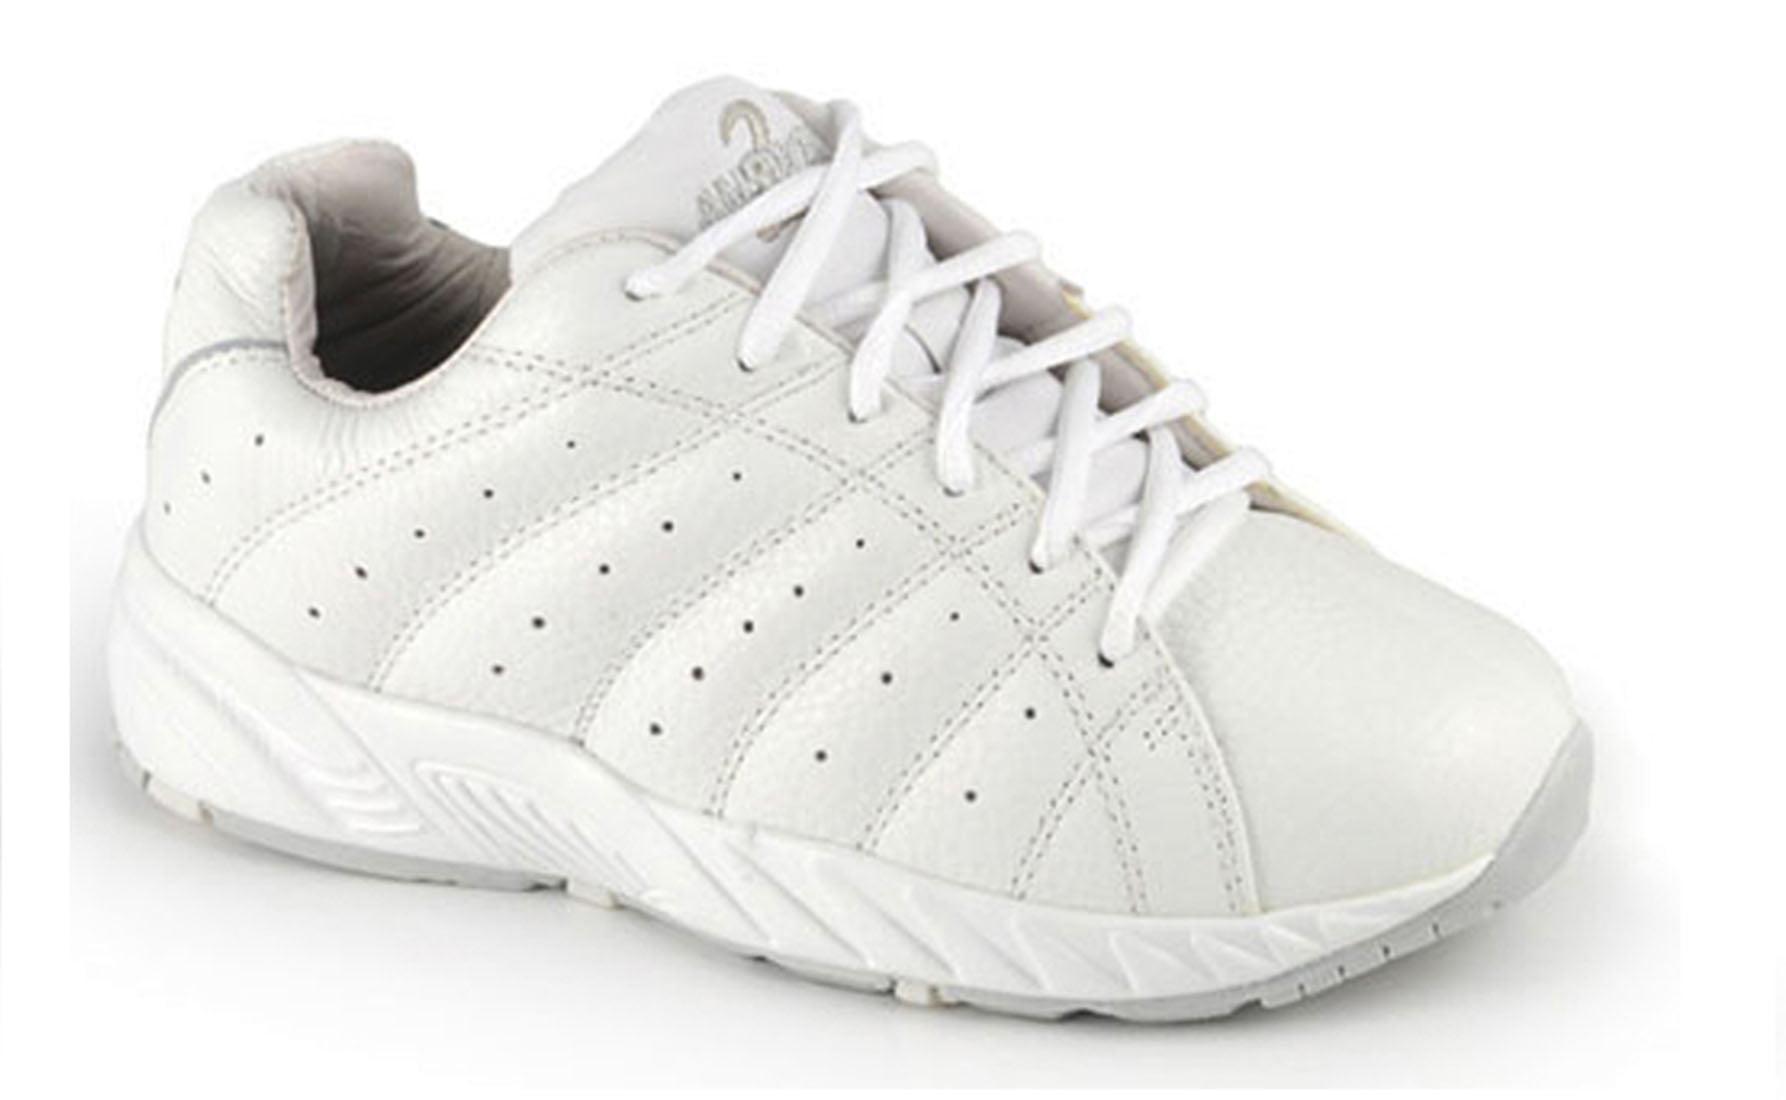 Women's Answer 2 447 Economical, stylish, and eye-catching shoes